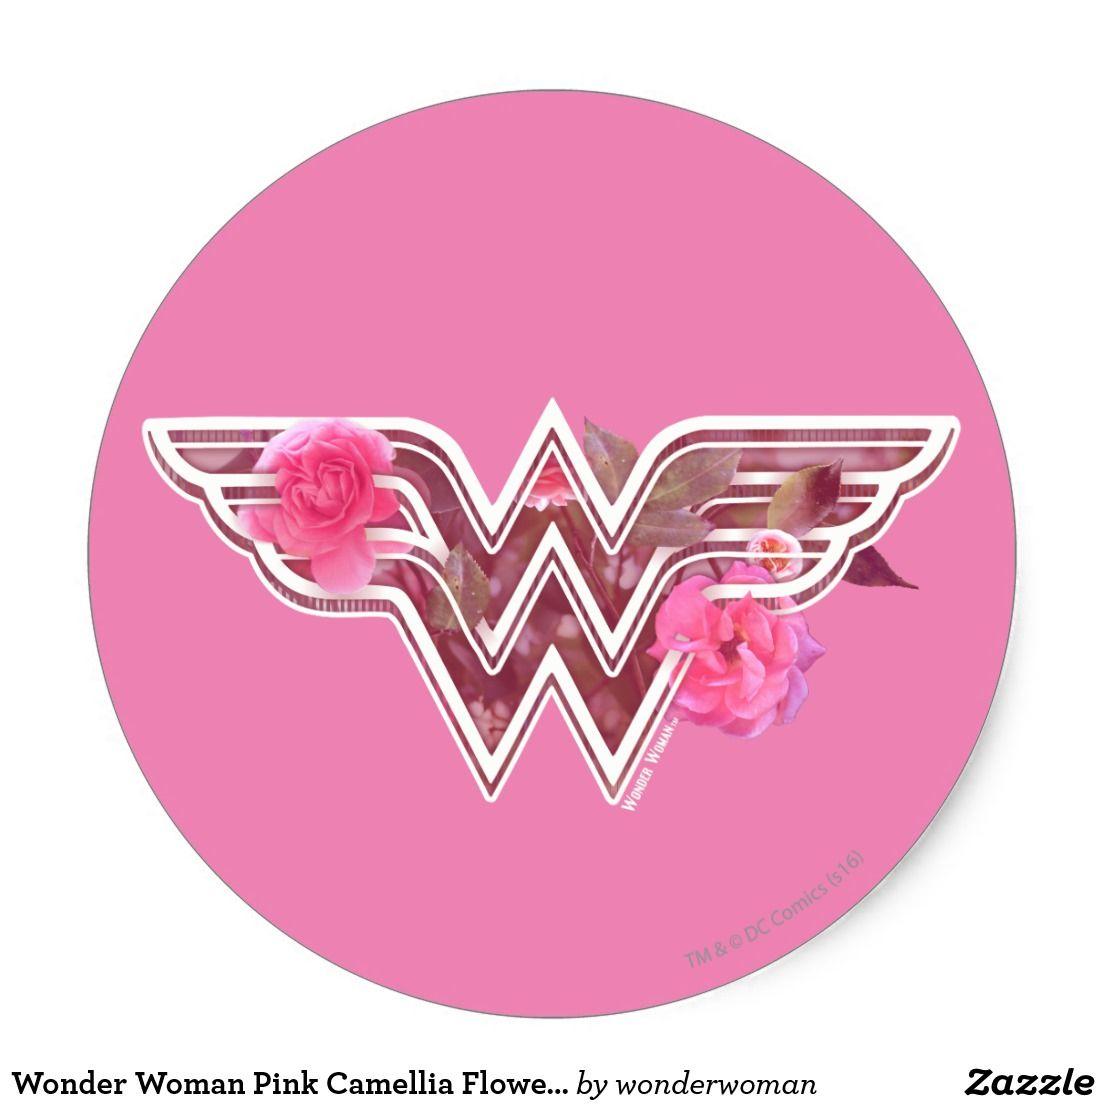 Wonder Woman Pink Camellia Flowers Logo Classic Round Sticker Zazzle Com Wonder Woman Design Wonder Woman Logo Wonder Woman [ 1106 x 1106 Pixel ]